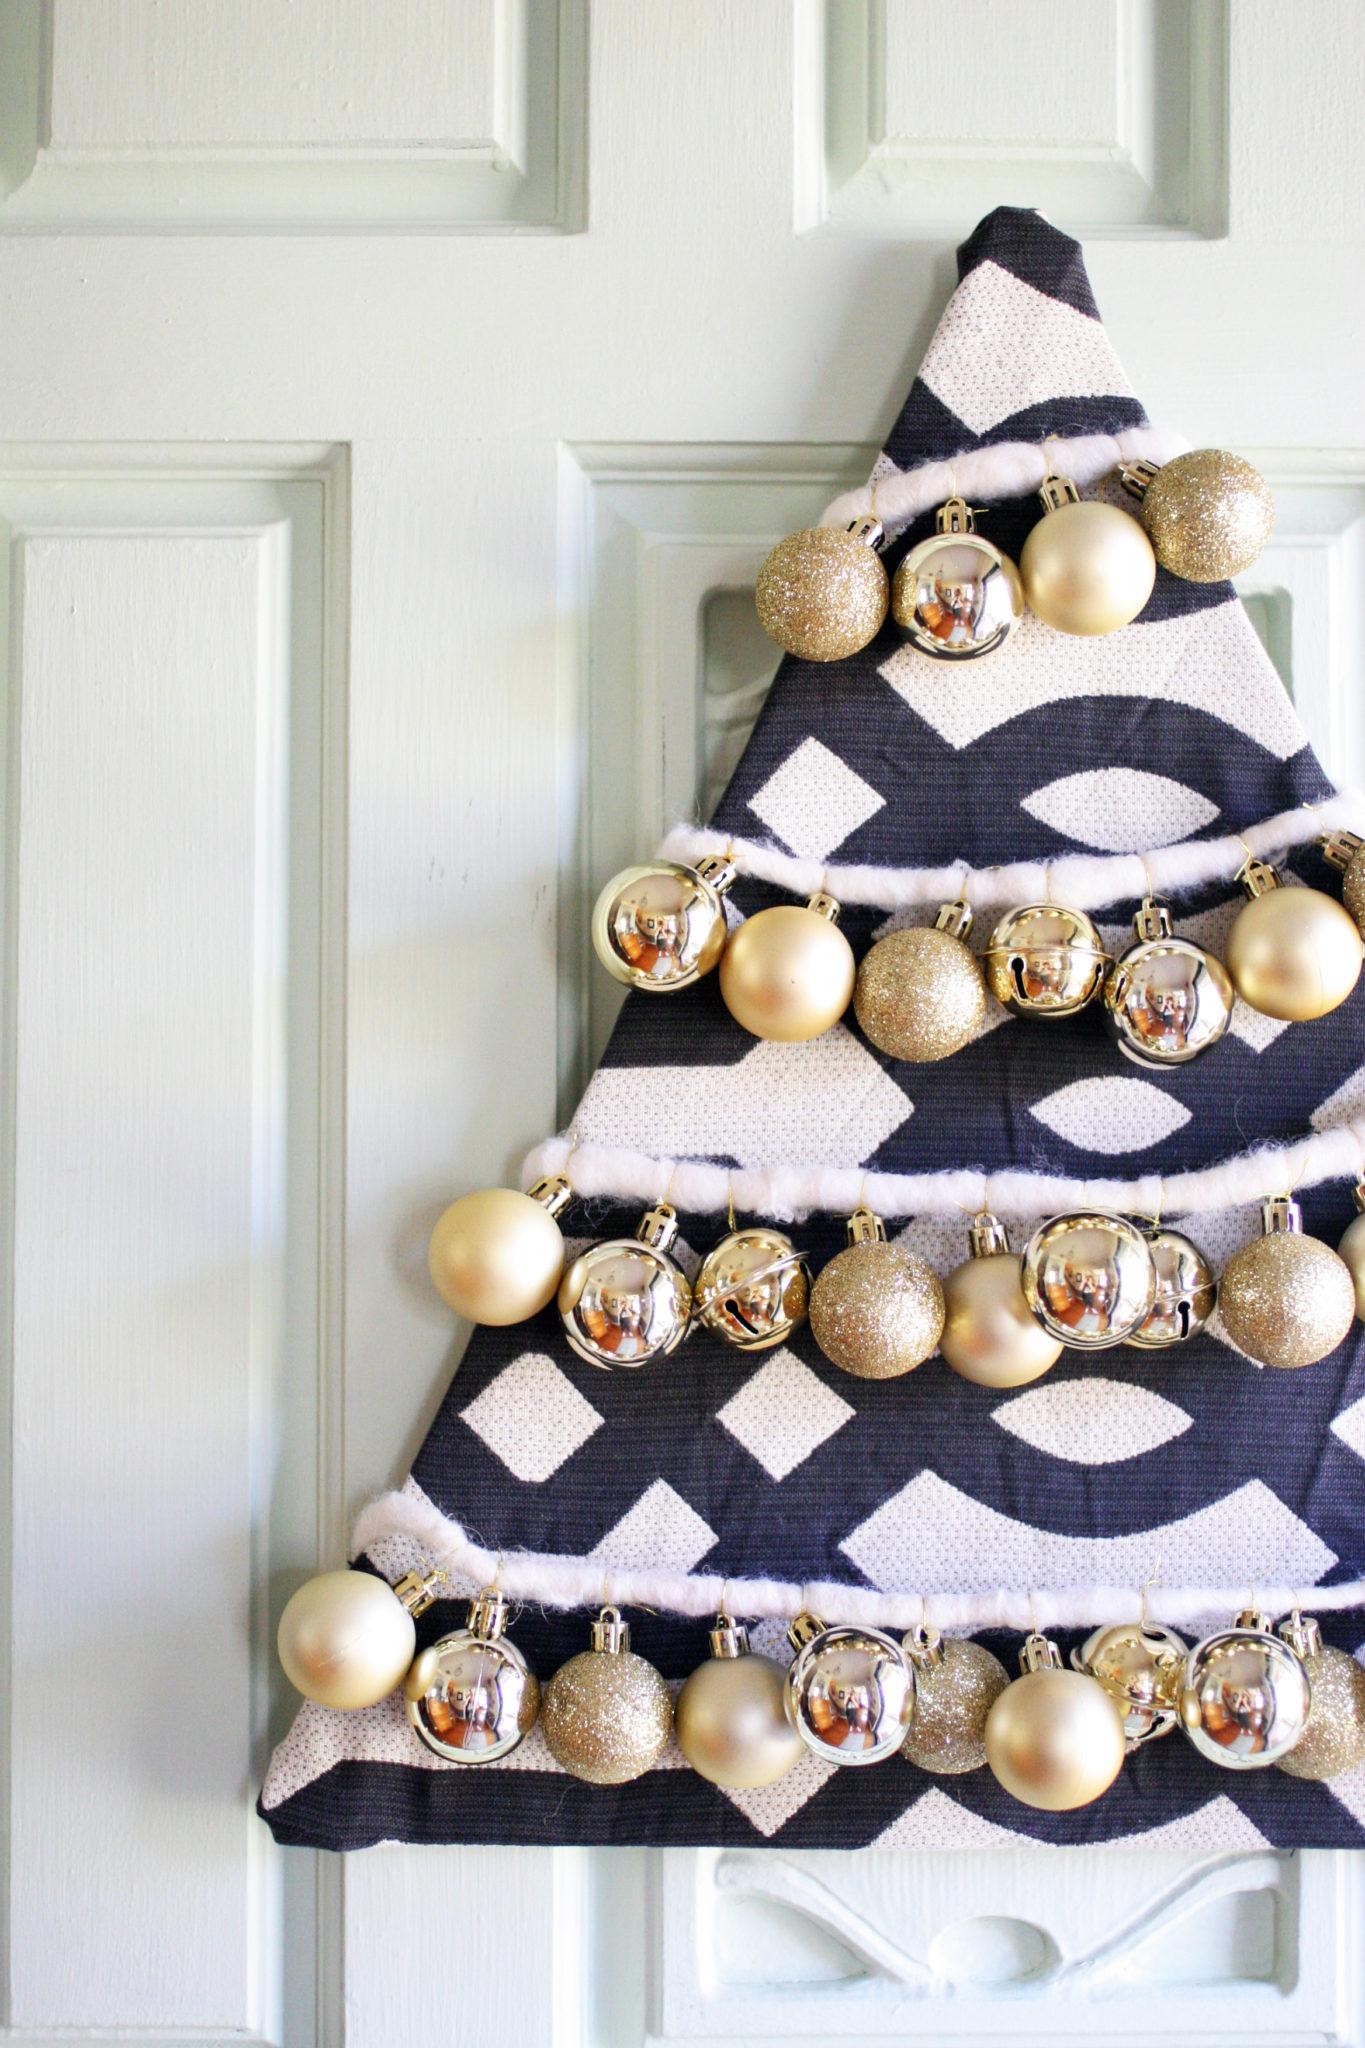 How To Make A Beautiful Diy Christmas Tree Wreath